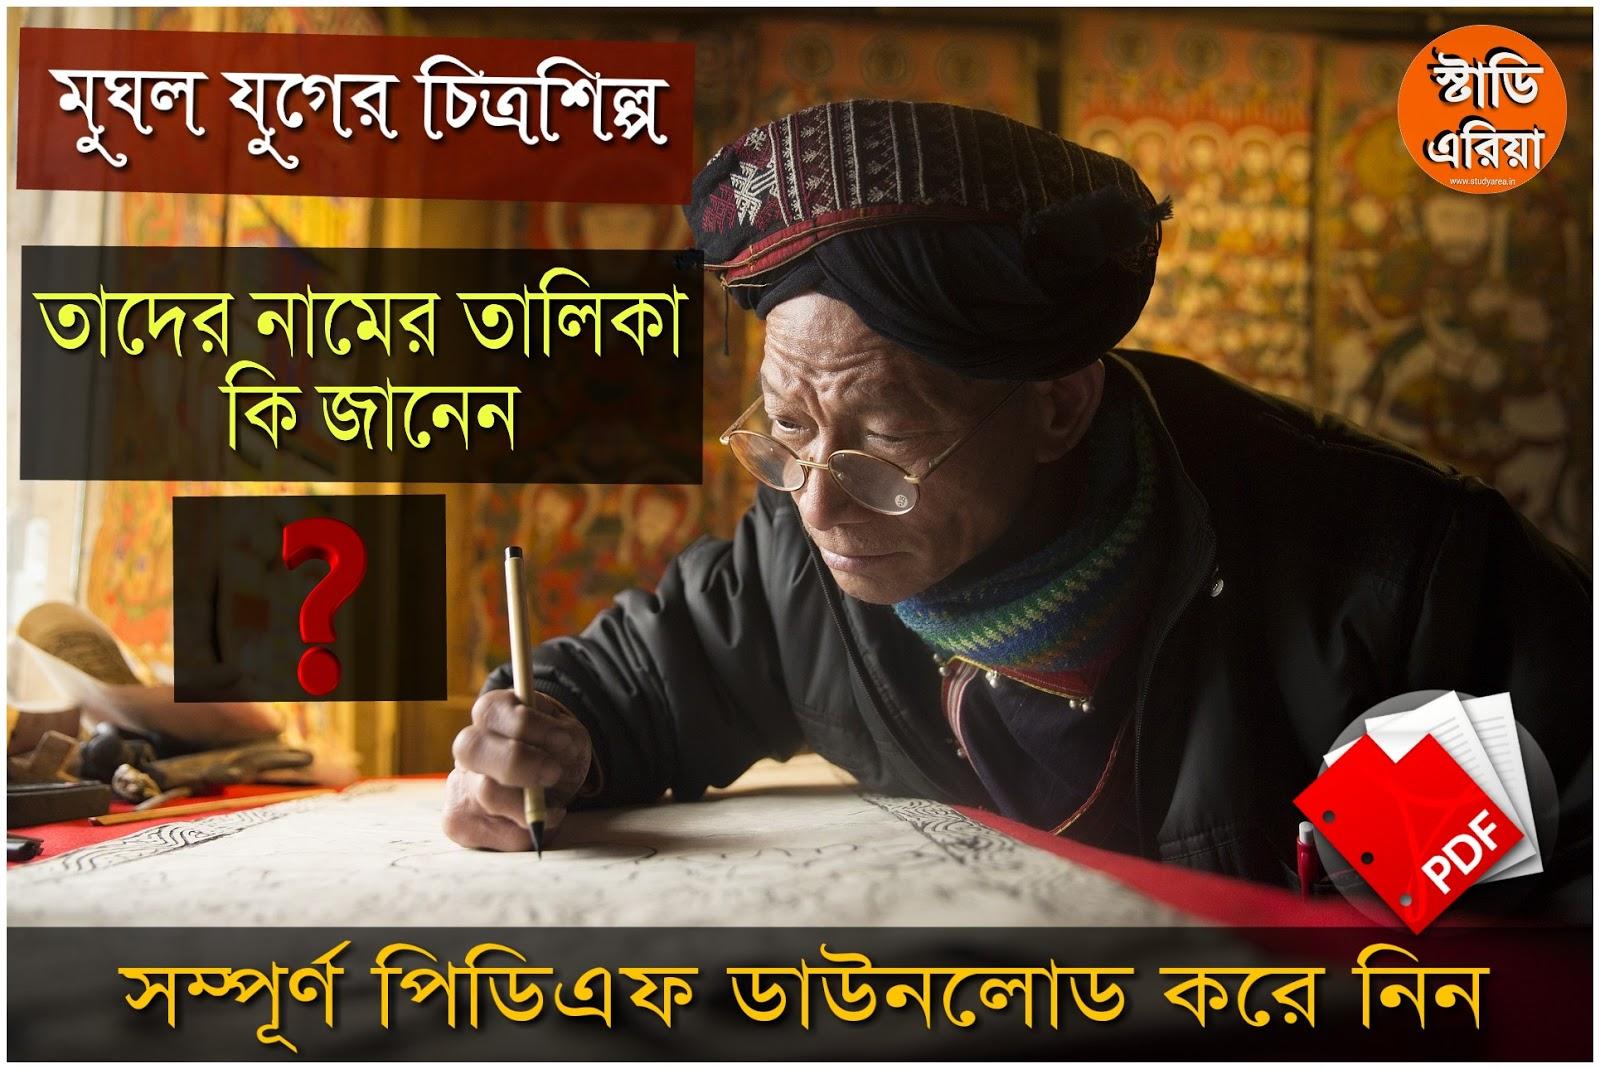 MUGAL Pictura Artist Name In Bengali PDF - মুঘল চিত্রশিল্পিদের নামের তালিকা পি ডি এফ